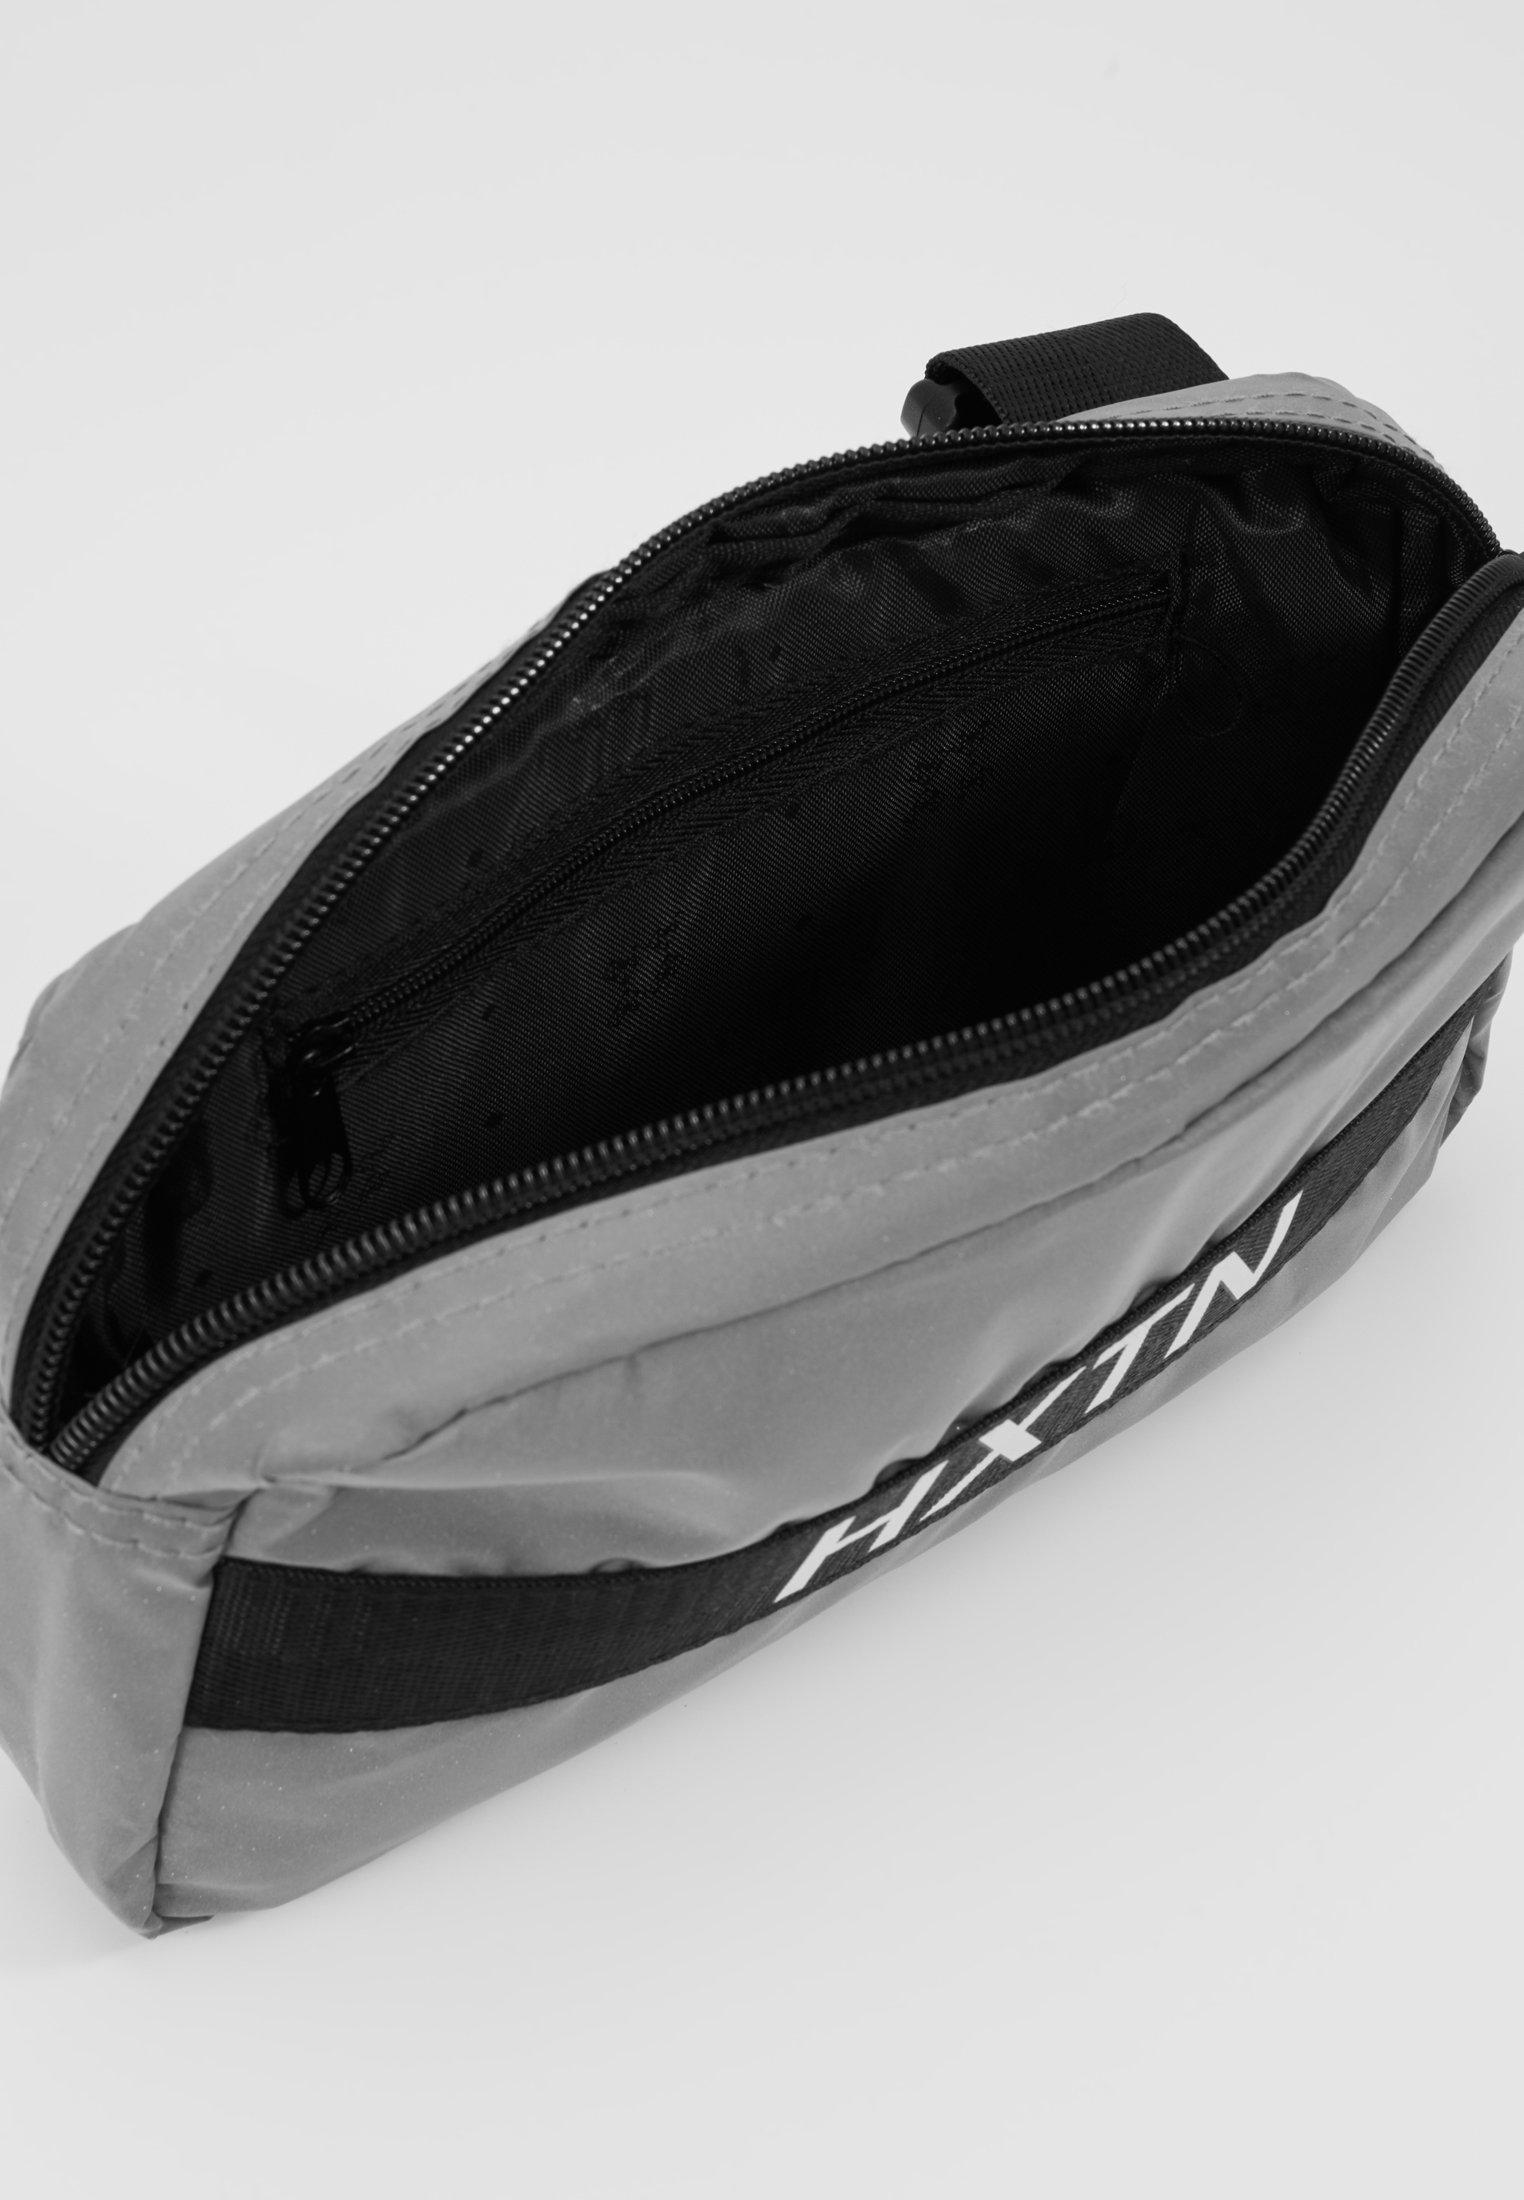 Hxtn Supply Delta Reflective Prime Body Bag - Marsupio Silver 7YF3sfc